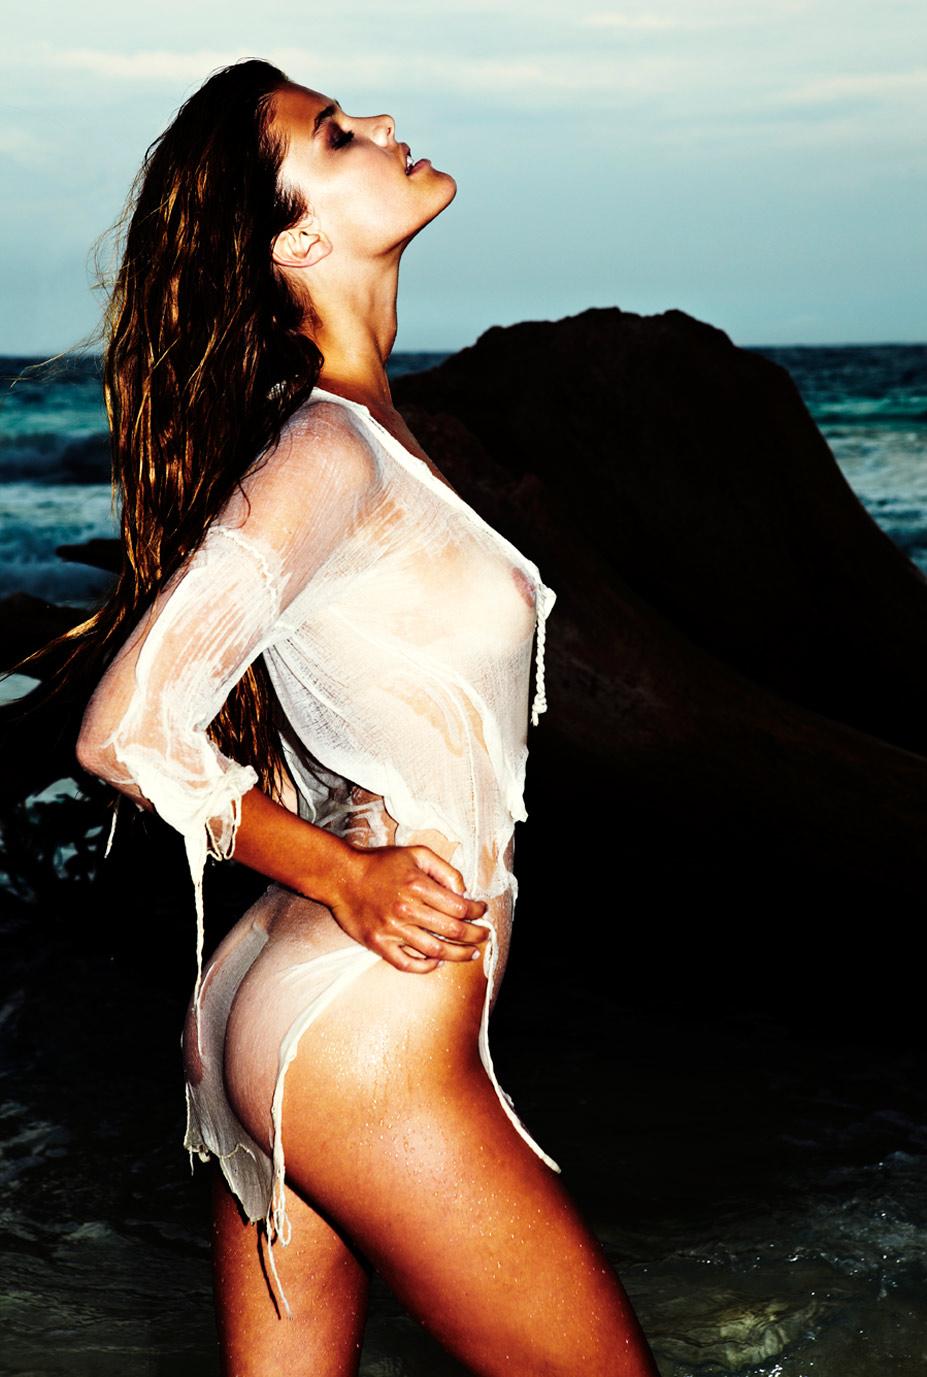 обнаженная Нина Агдал / Nina Agdal - Antoine Verglas in Gosee Magazine 26 june 2014